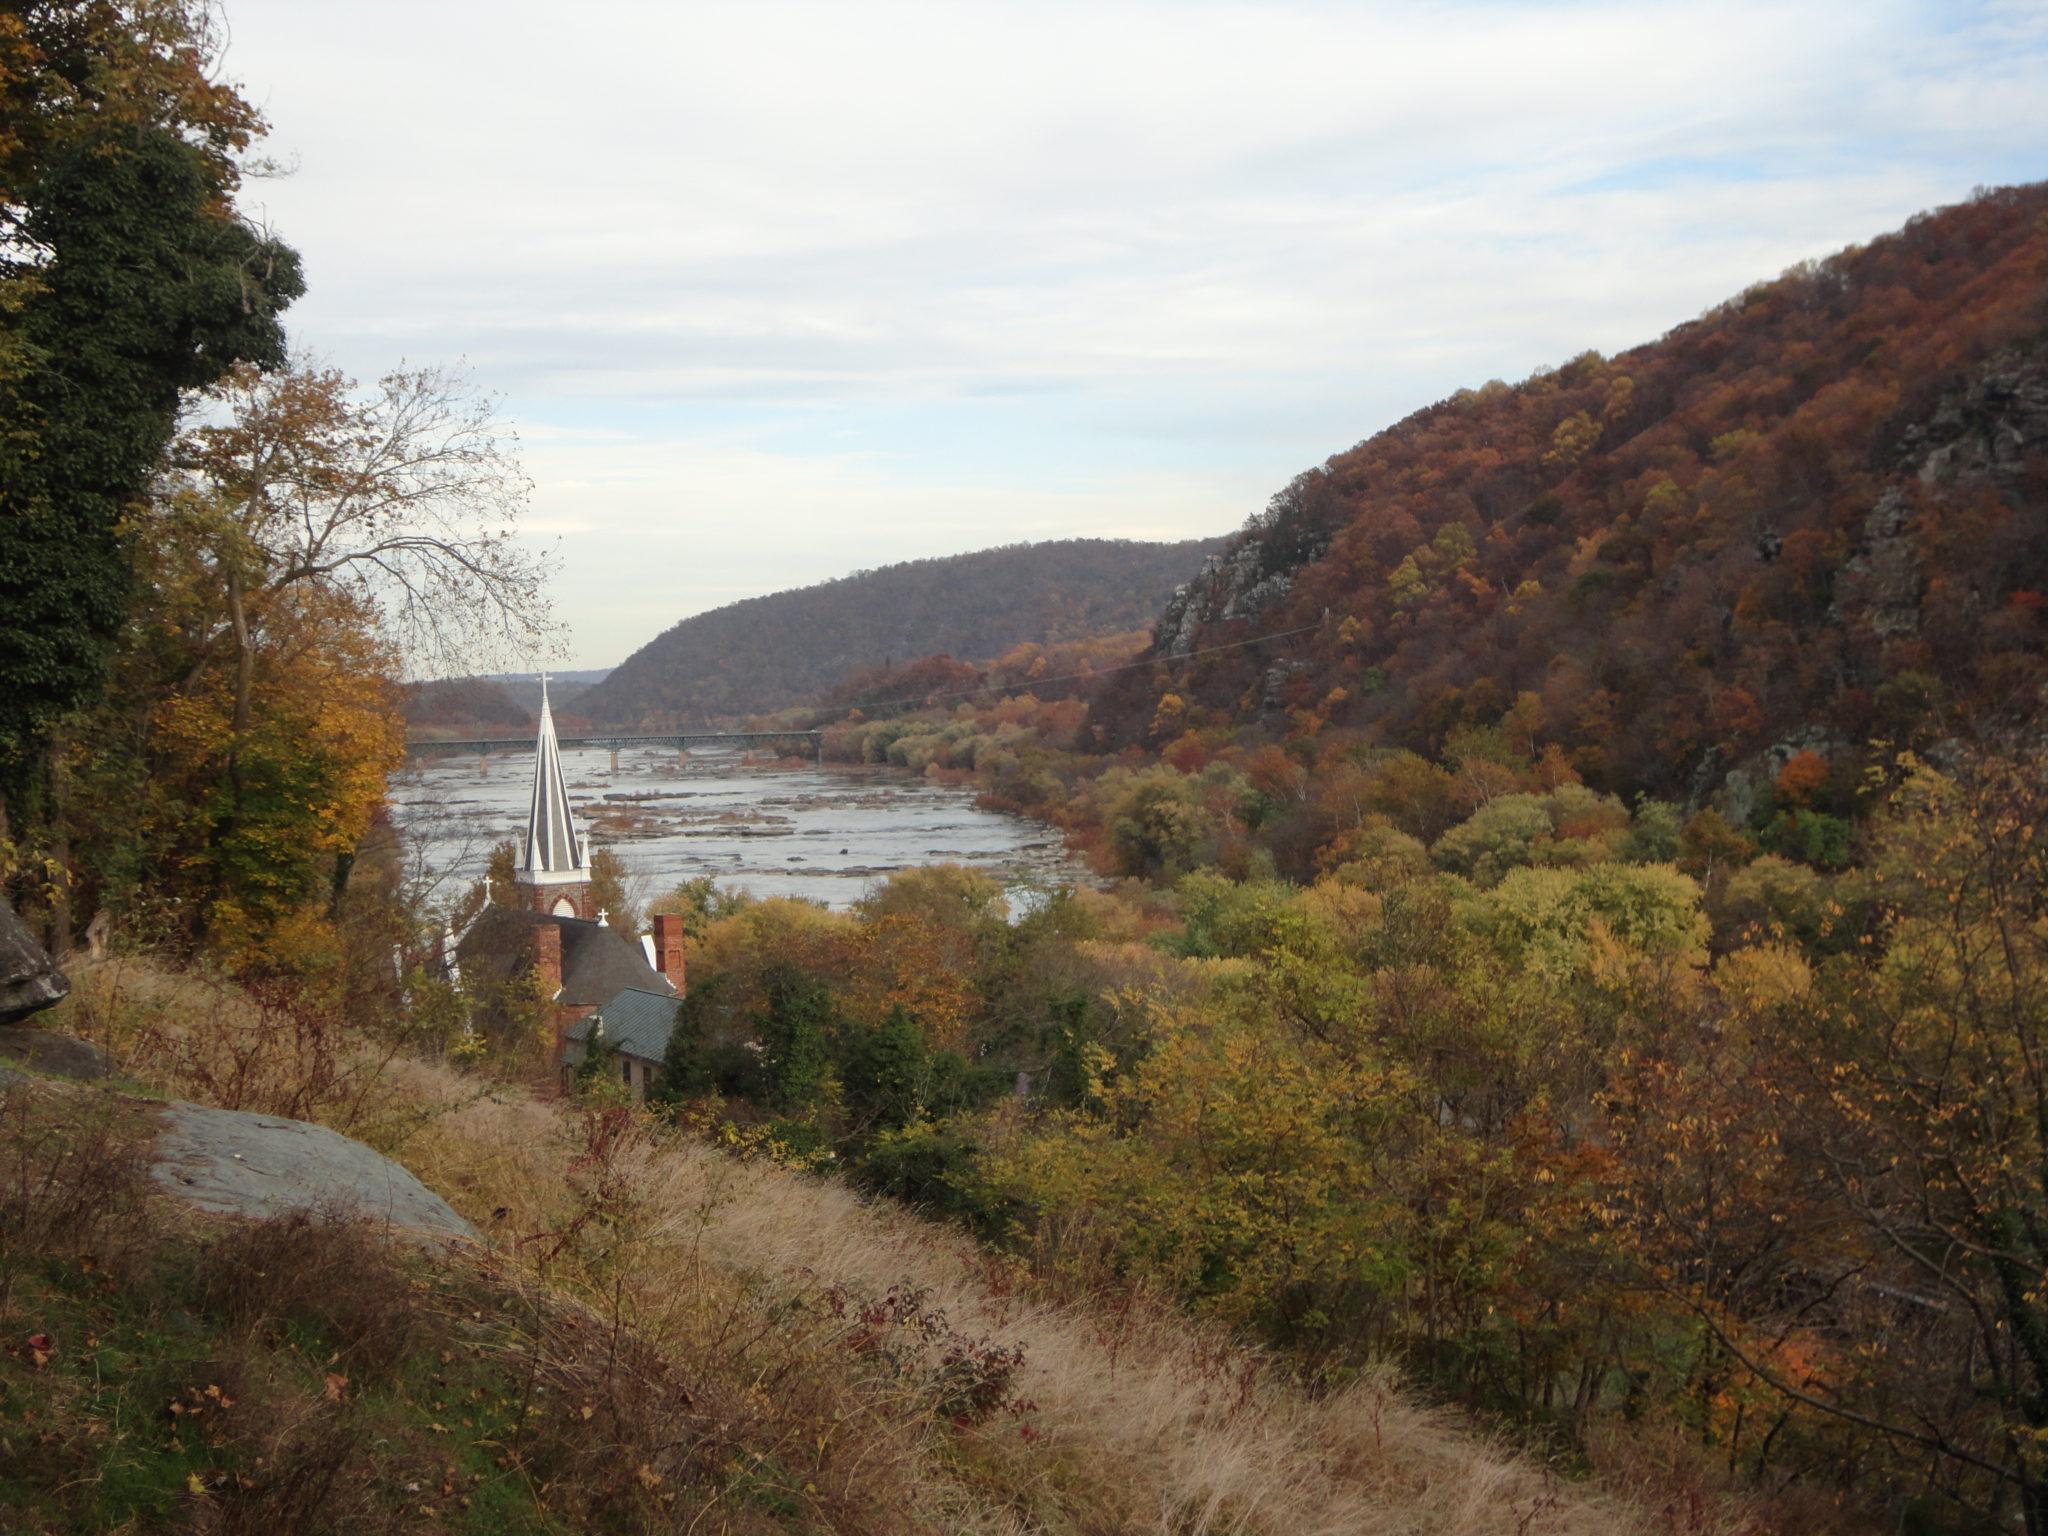 View of Harpers Ferry from near Jefferson Rock